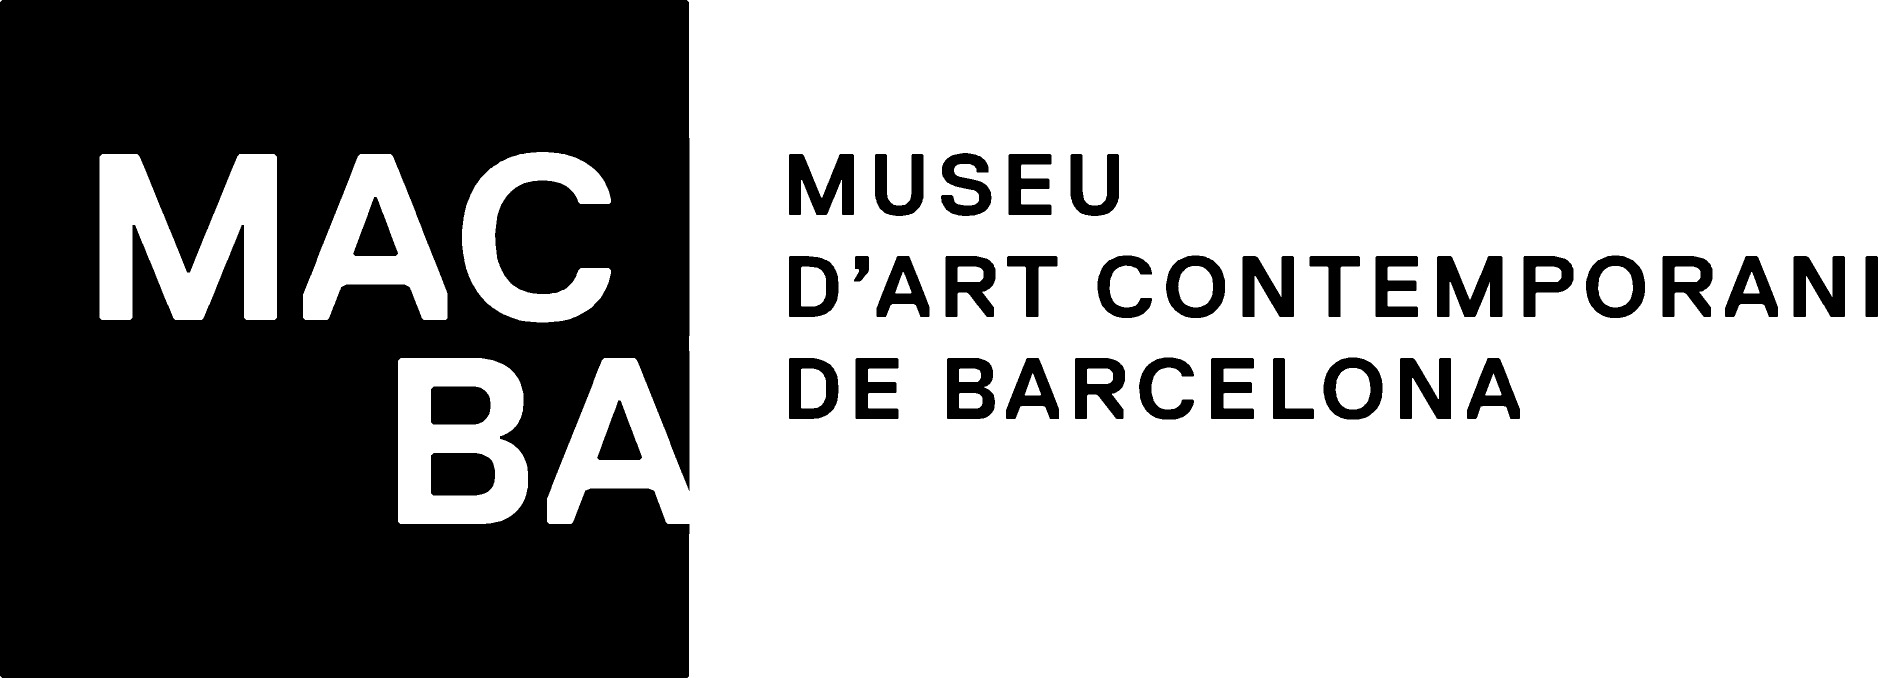 Logo_Macba_recortado